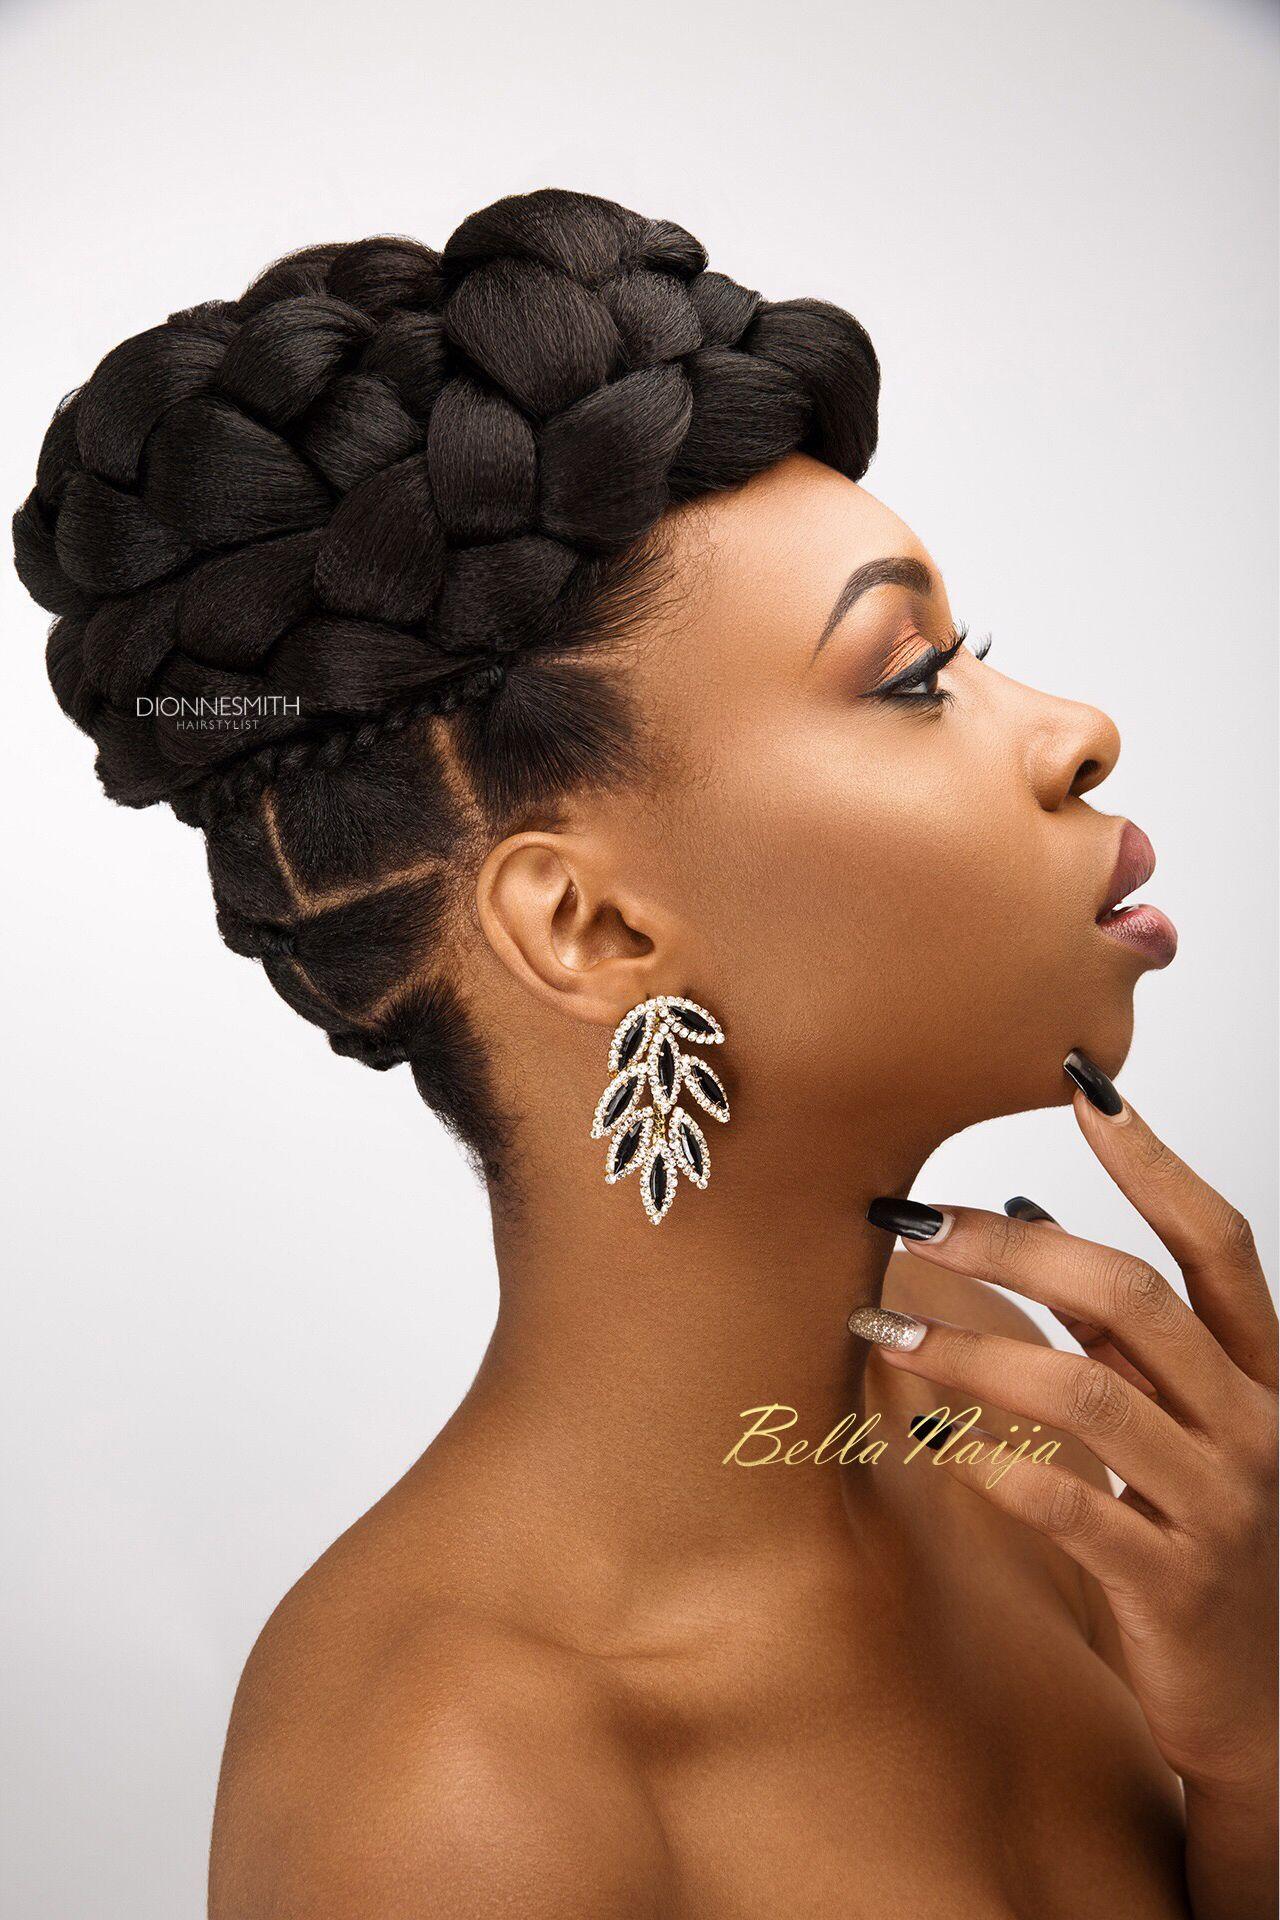 Afro Hairstyles hairstyleforblackwomen.net 49